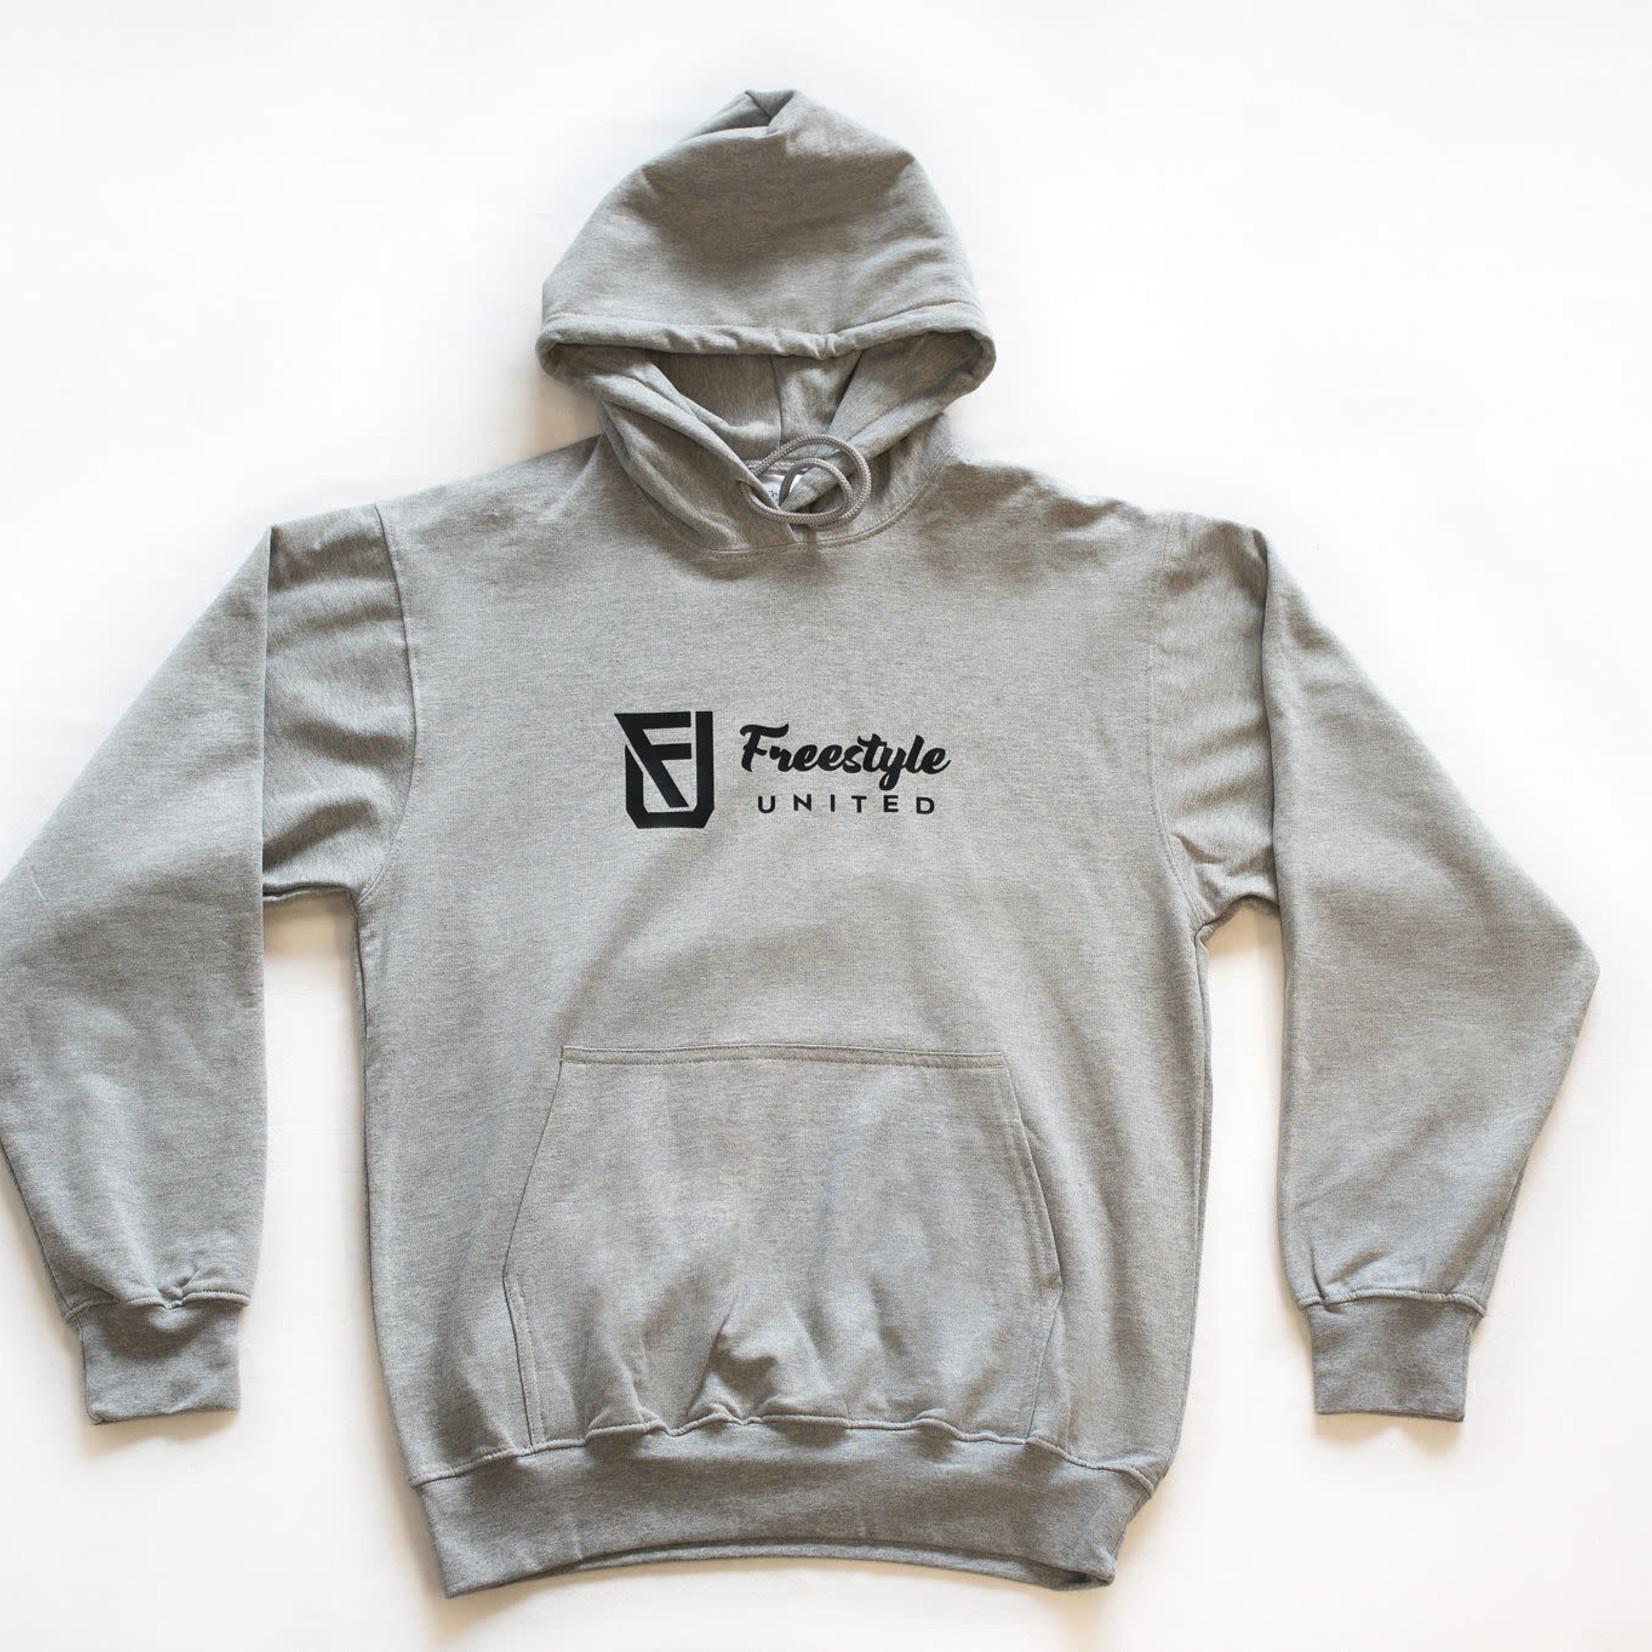 Freestyle United Freestyle United - Adult OG Hoodie - Light Grey